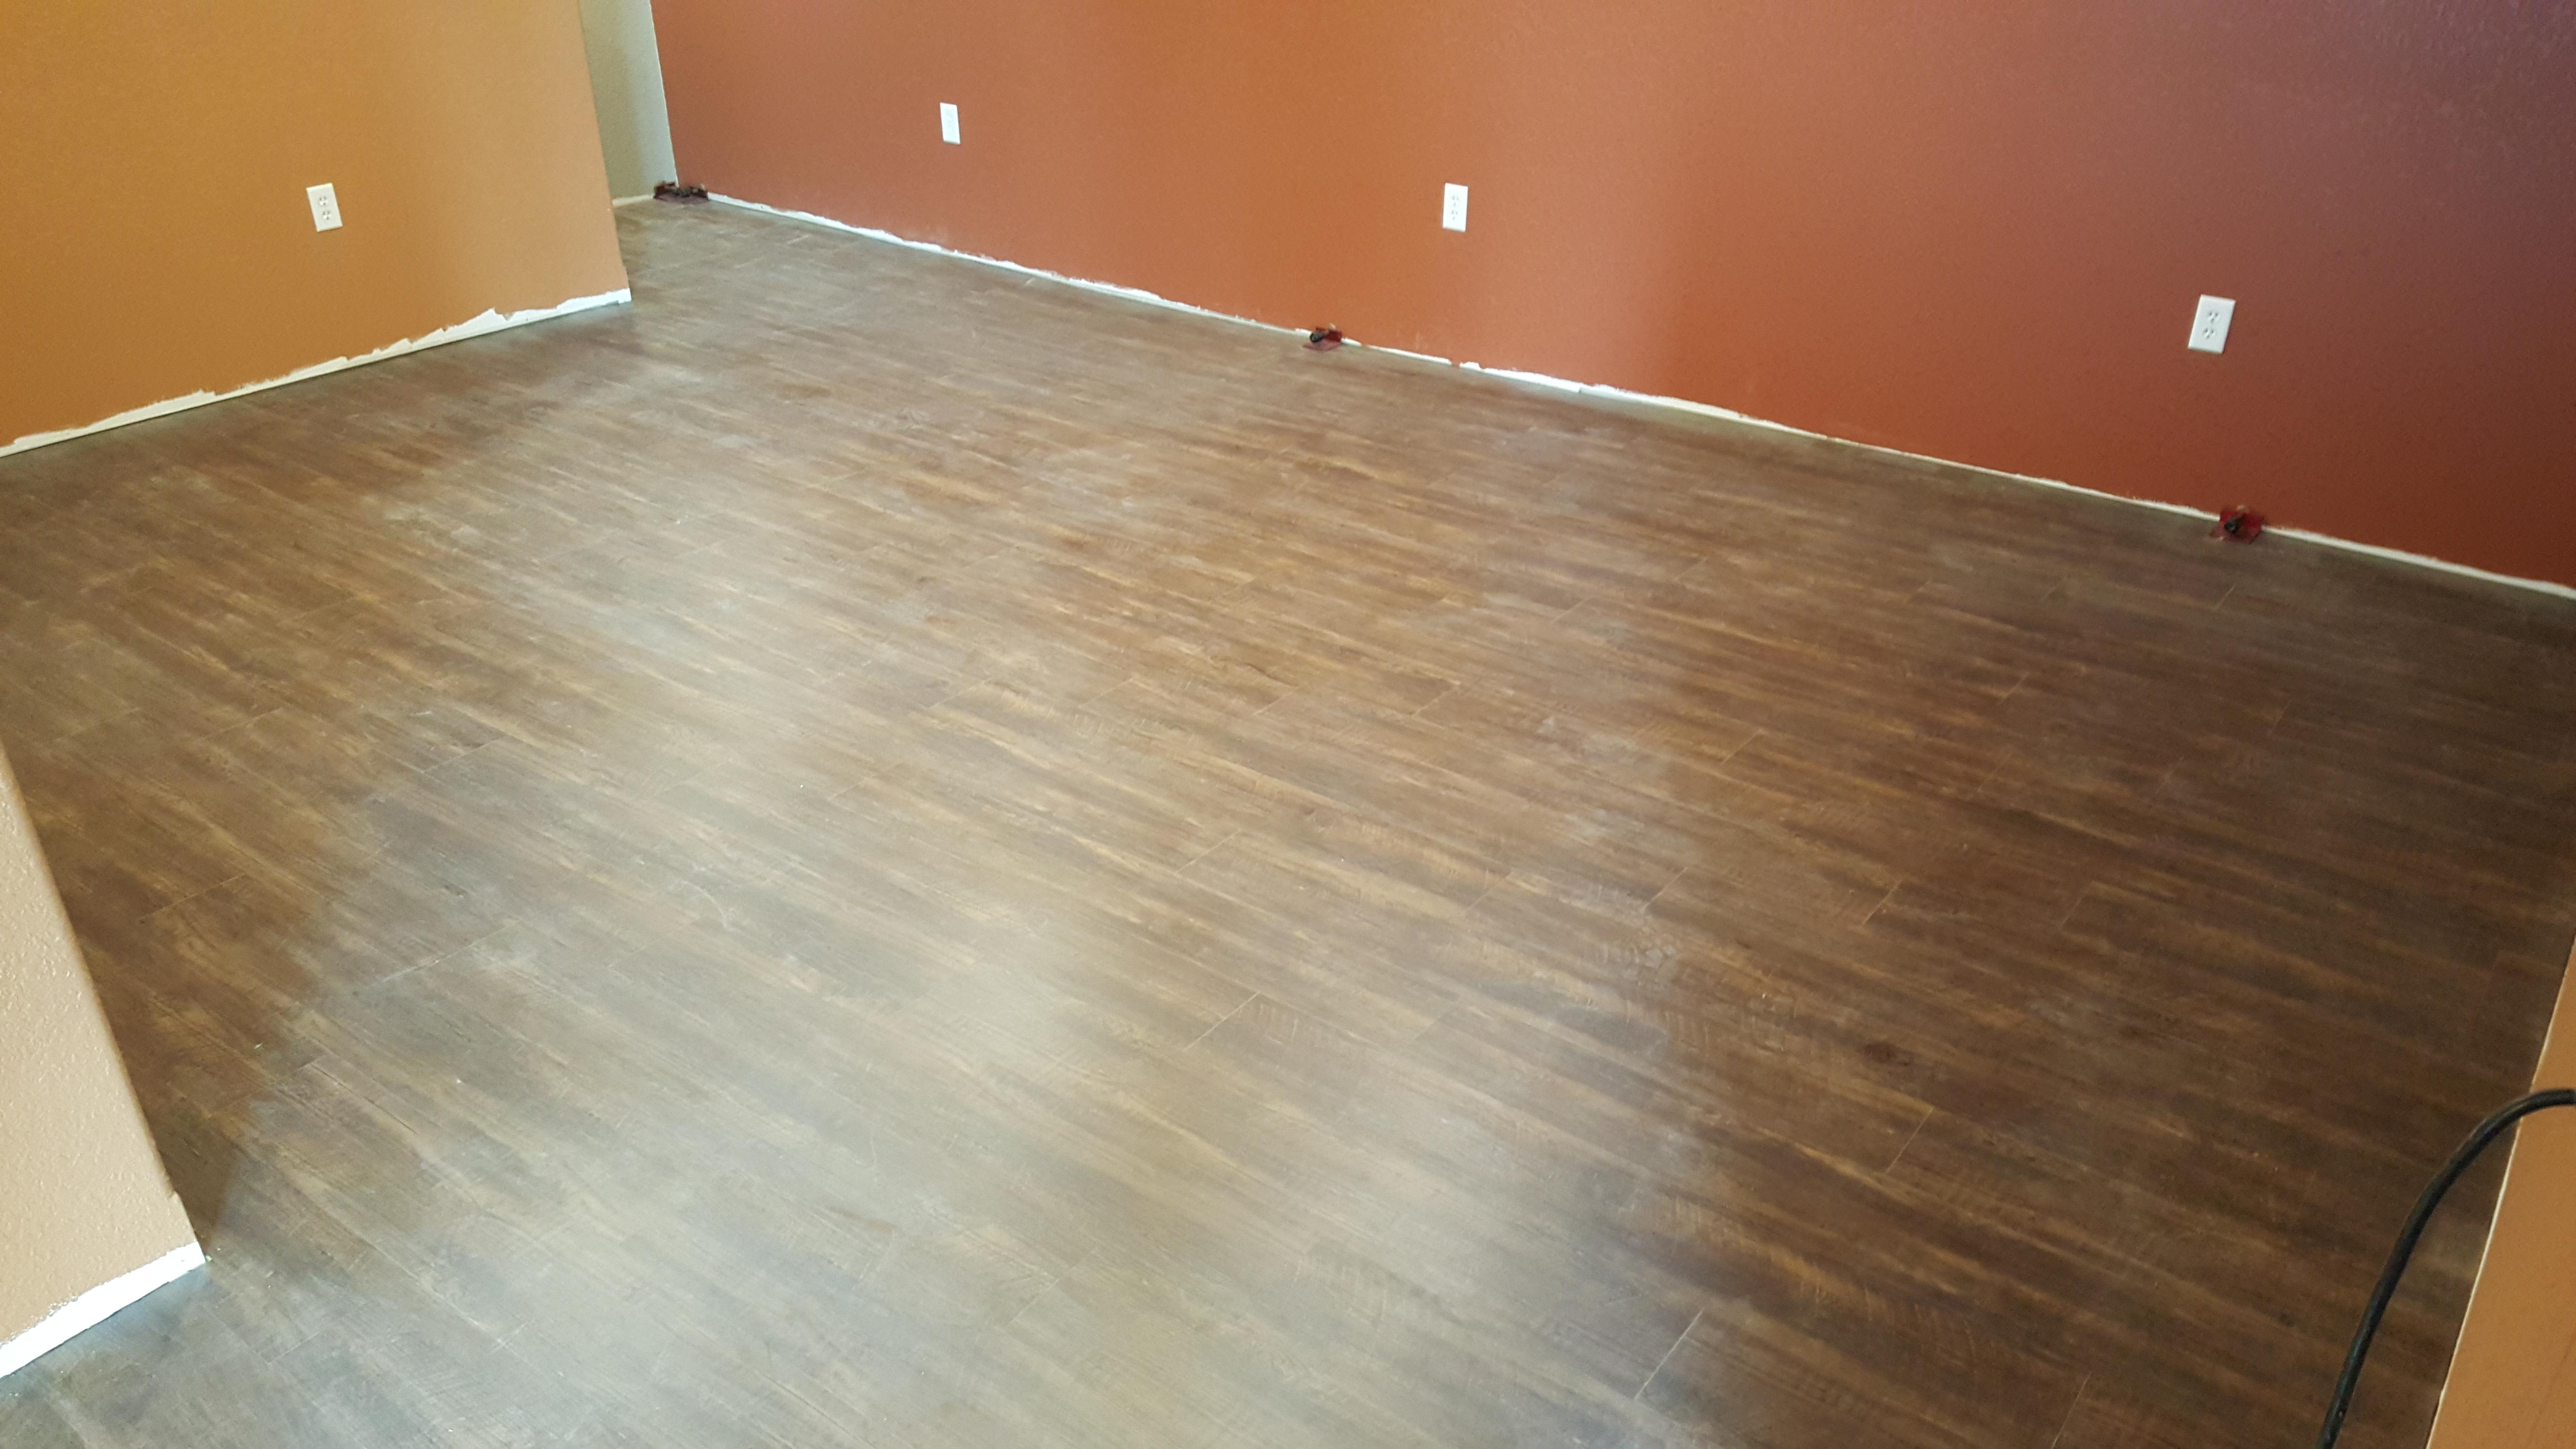 Laminate tile flooring installation